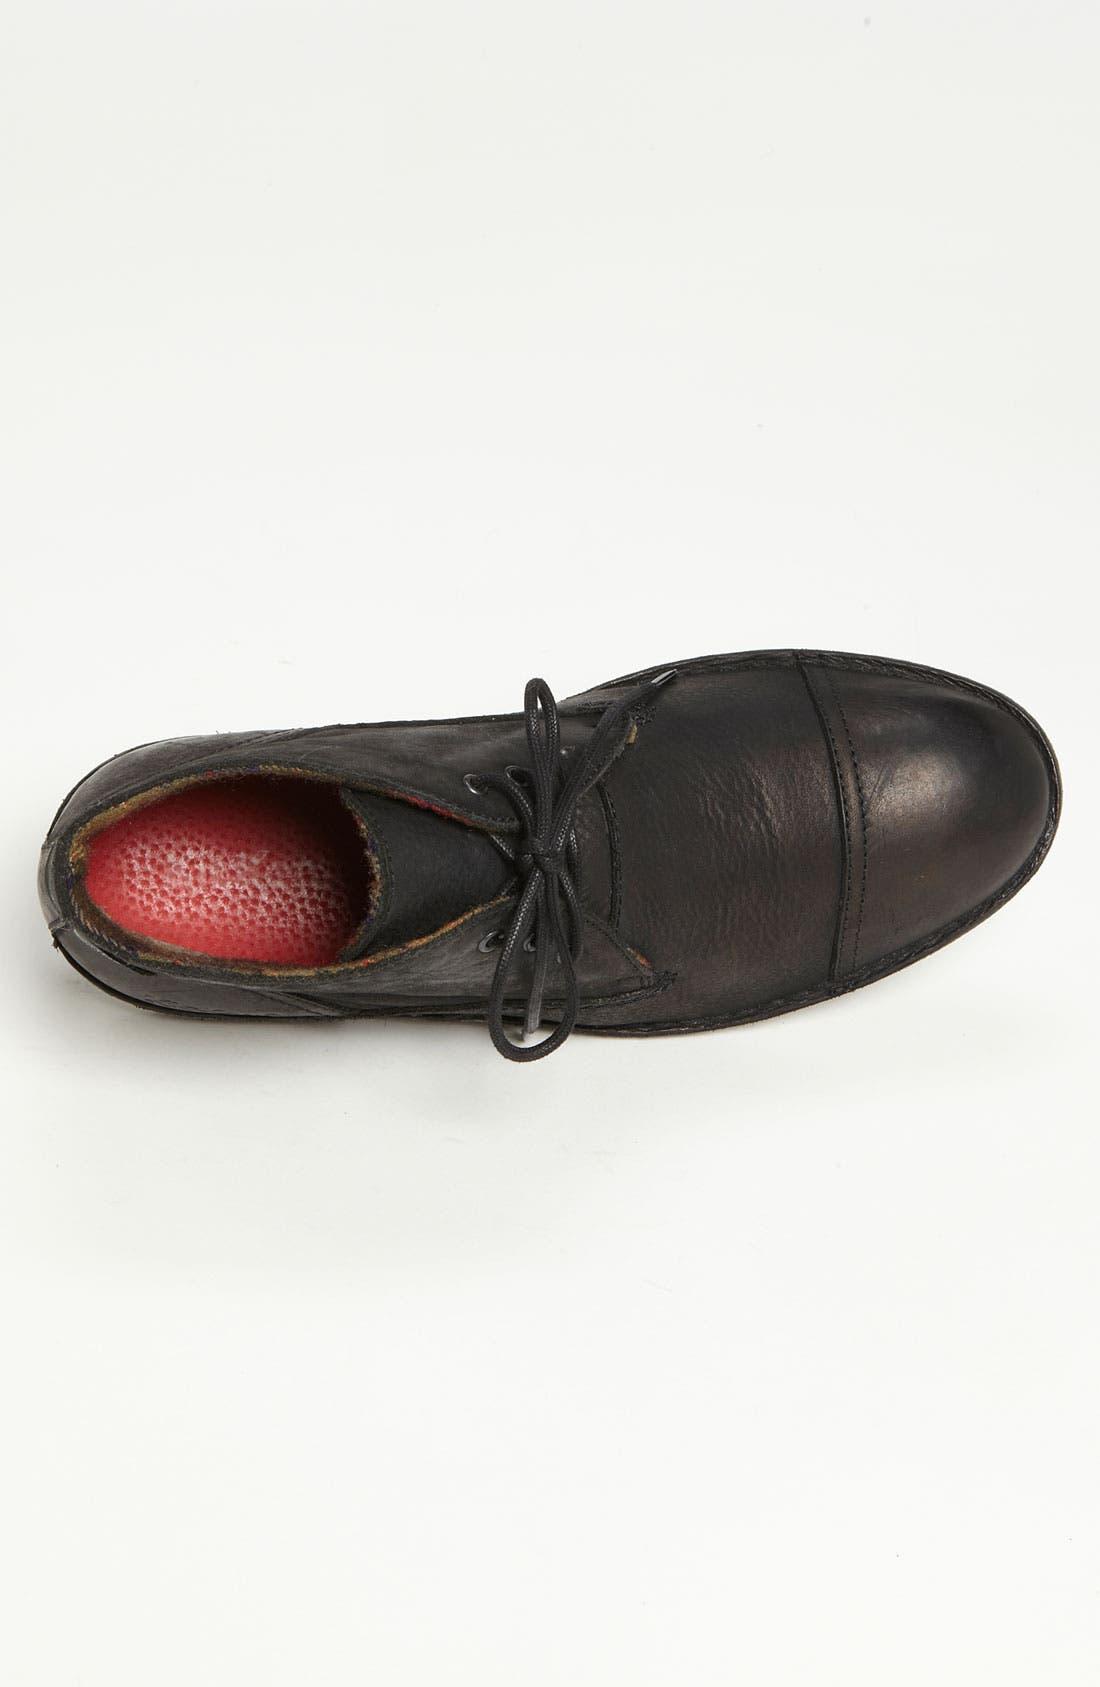 Alternate Image 3  - Kickers 'Edgo' Chukka Boot (Online Only)